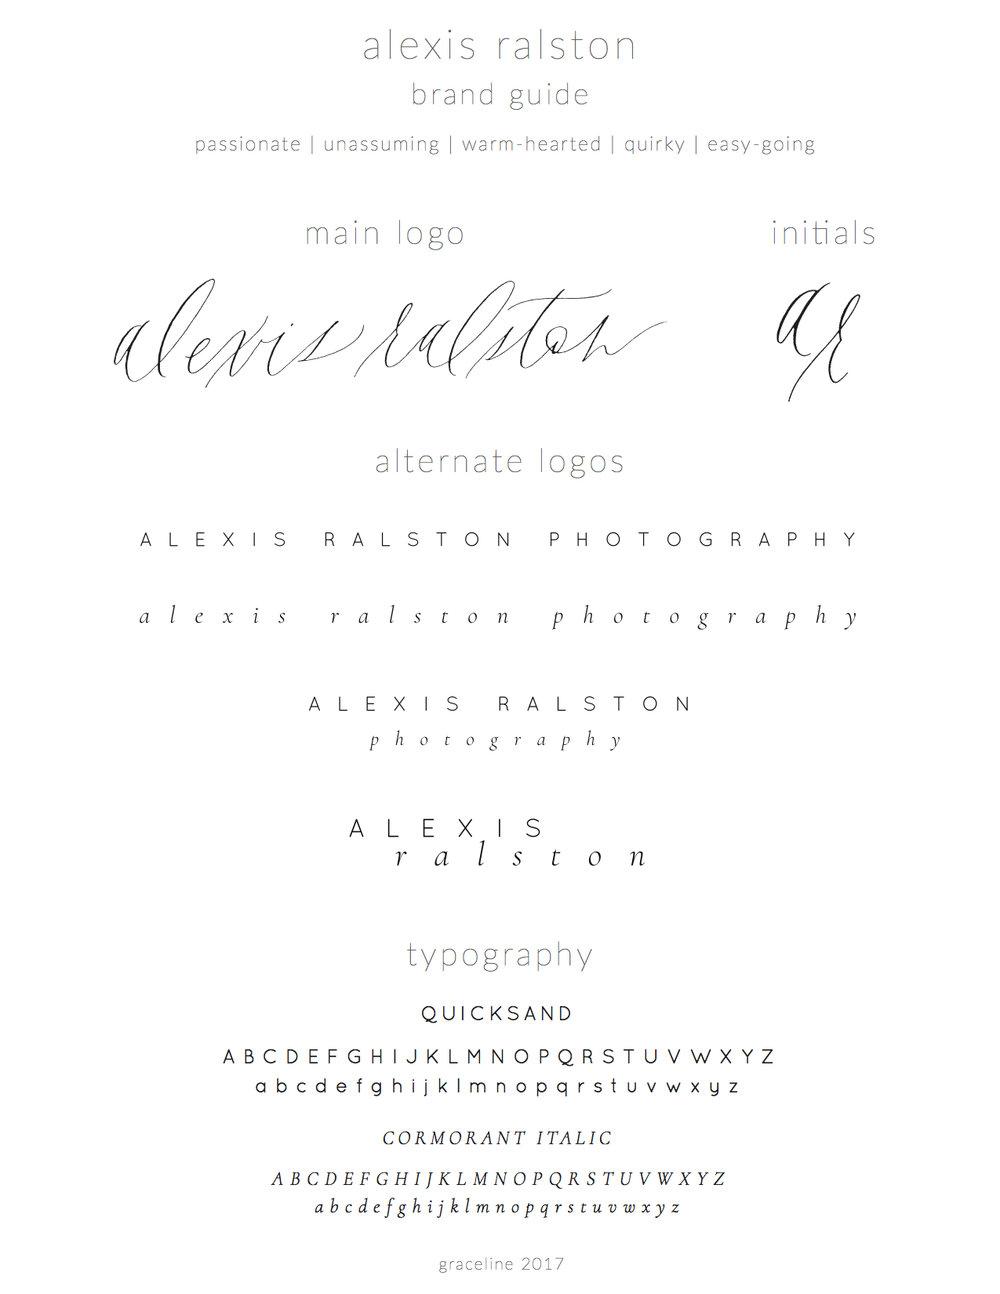 Emma Rose Company Squarespace Website Designer | Alexis Ralston Photography Website Launch | Project Details Portfolio